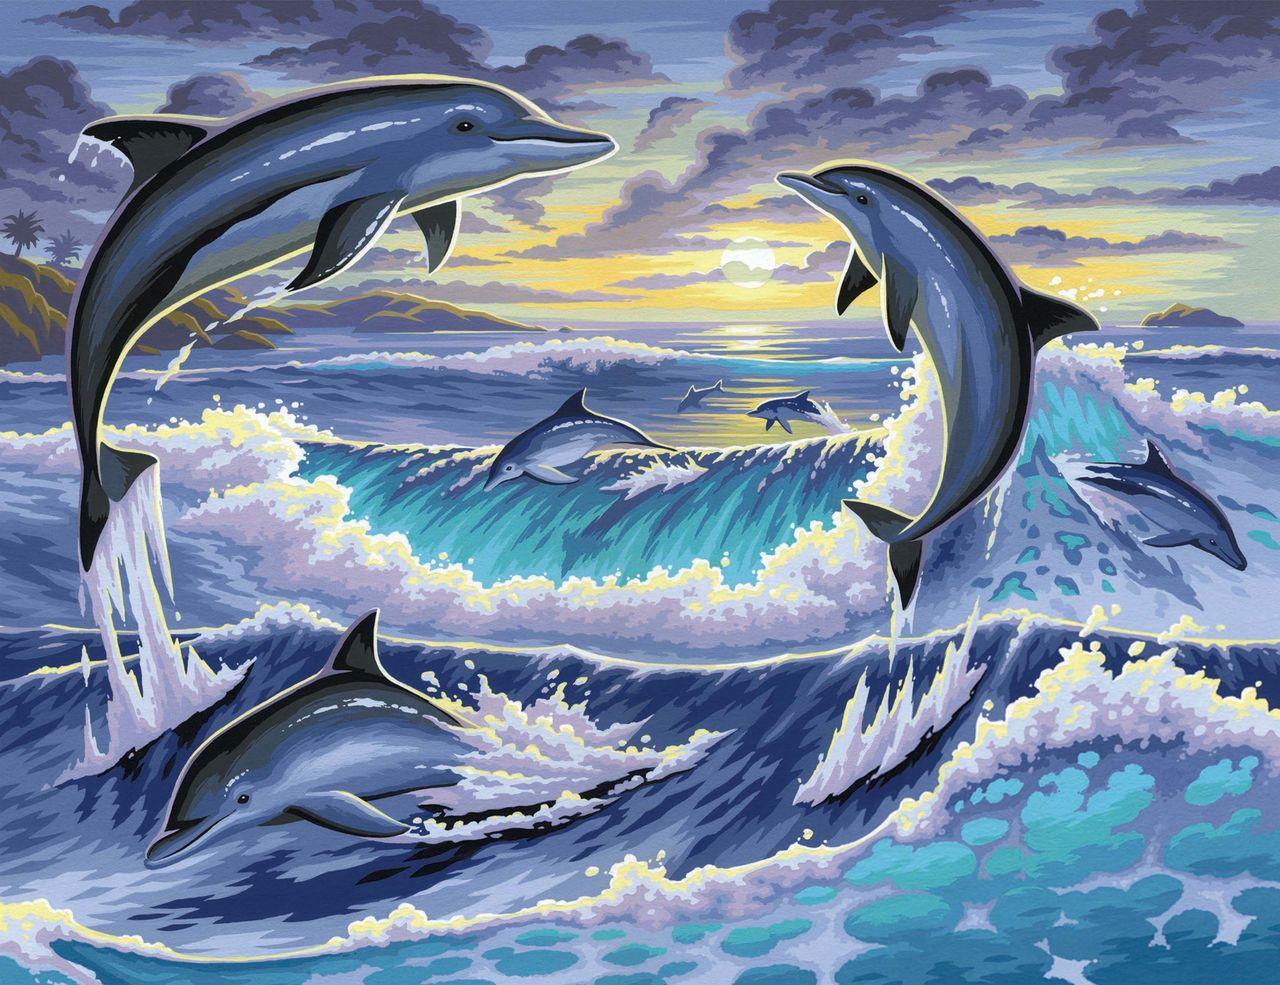 Schnittmuster delfin kostenloses Slip Luise